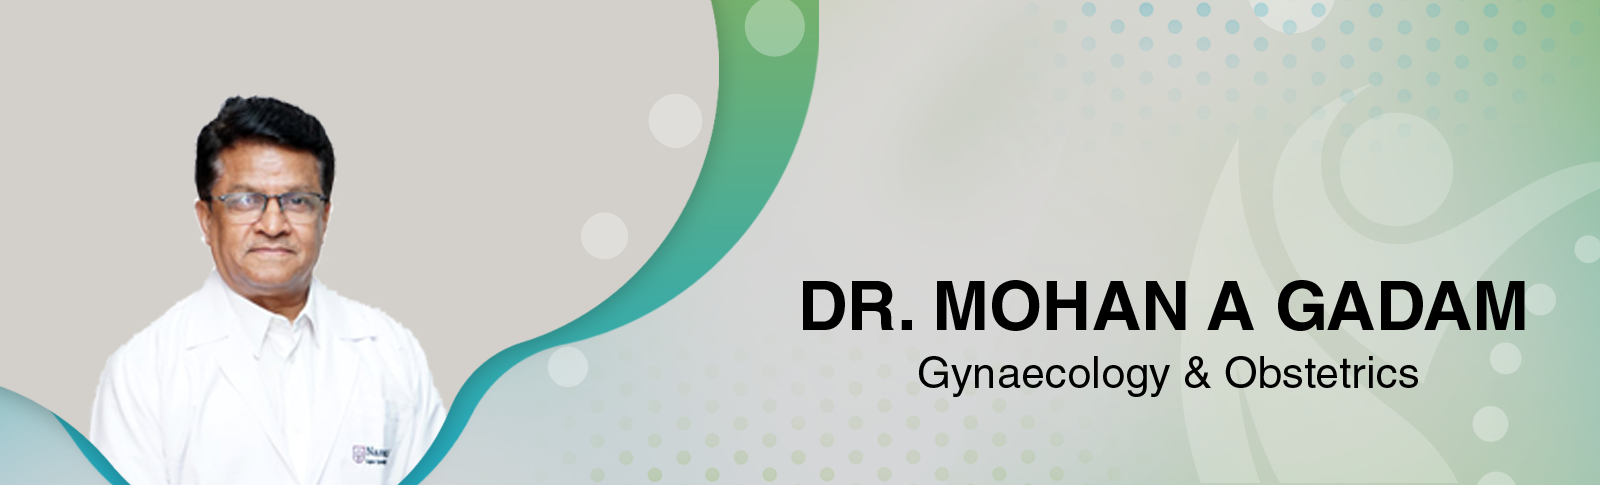 Dr. Mohan A. Gadam